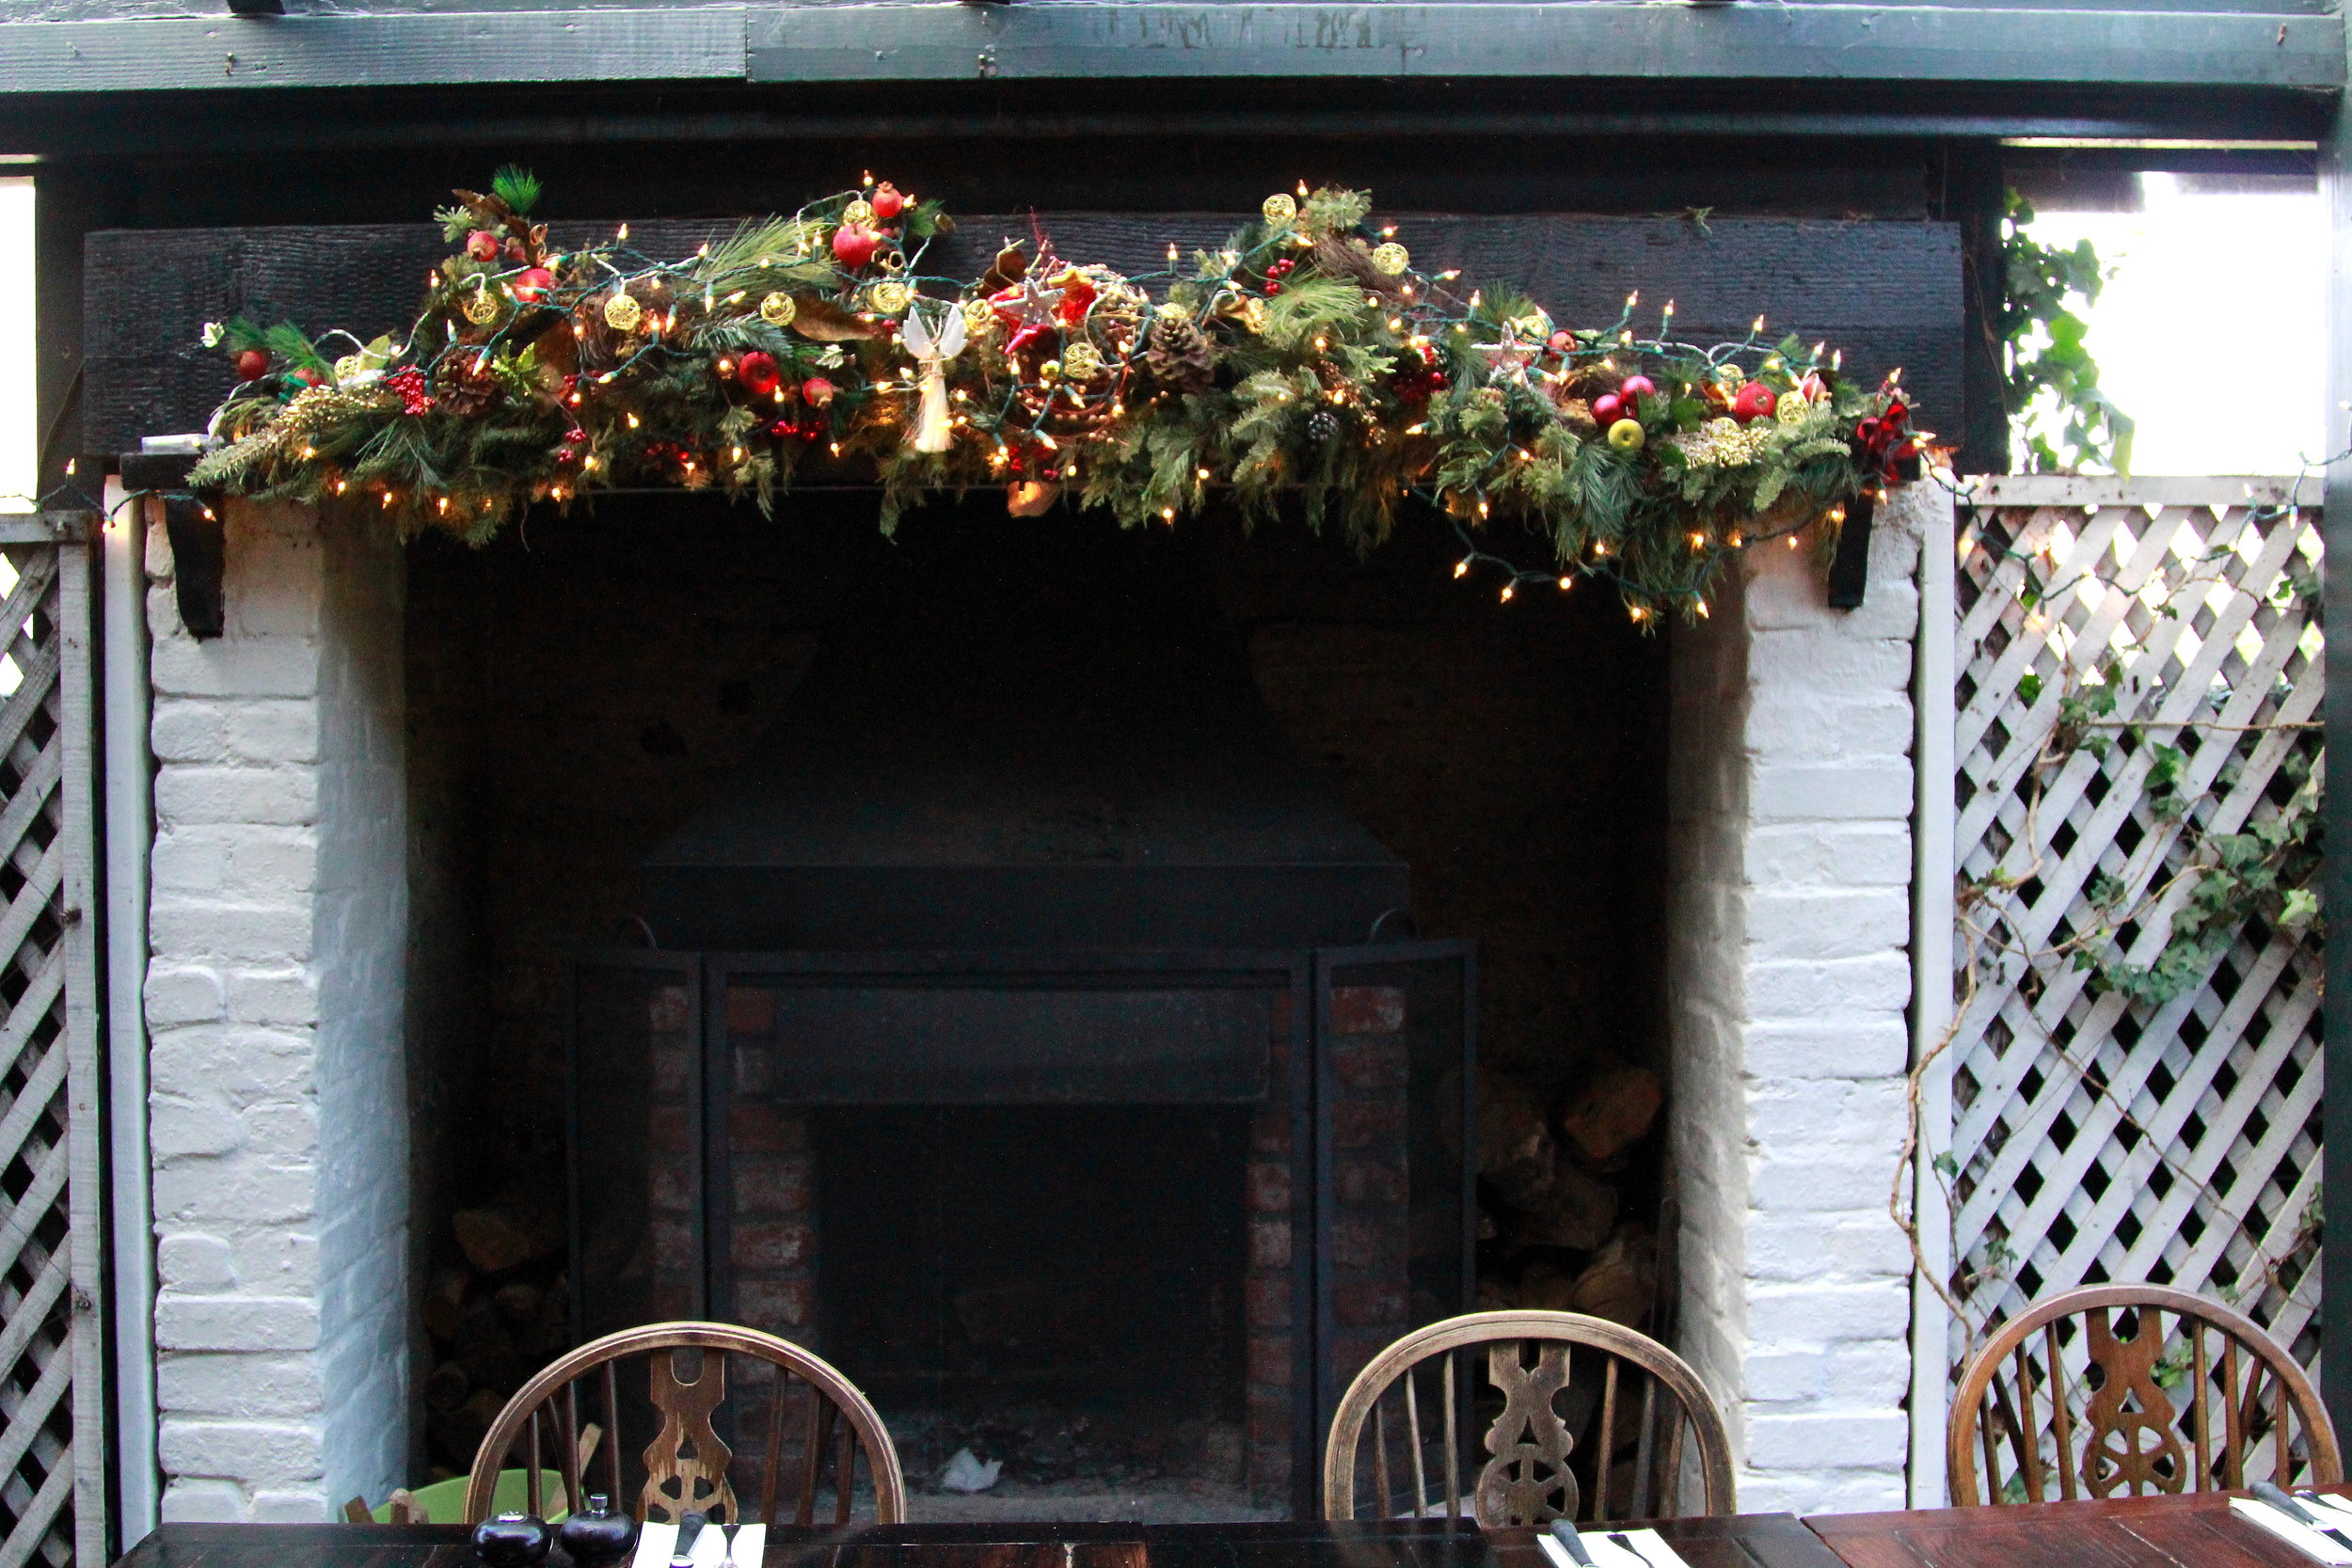 Christmas season at the Pelican Inn